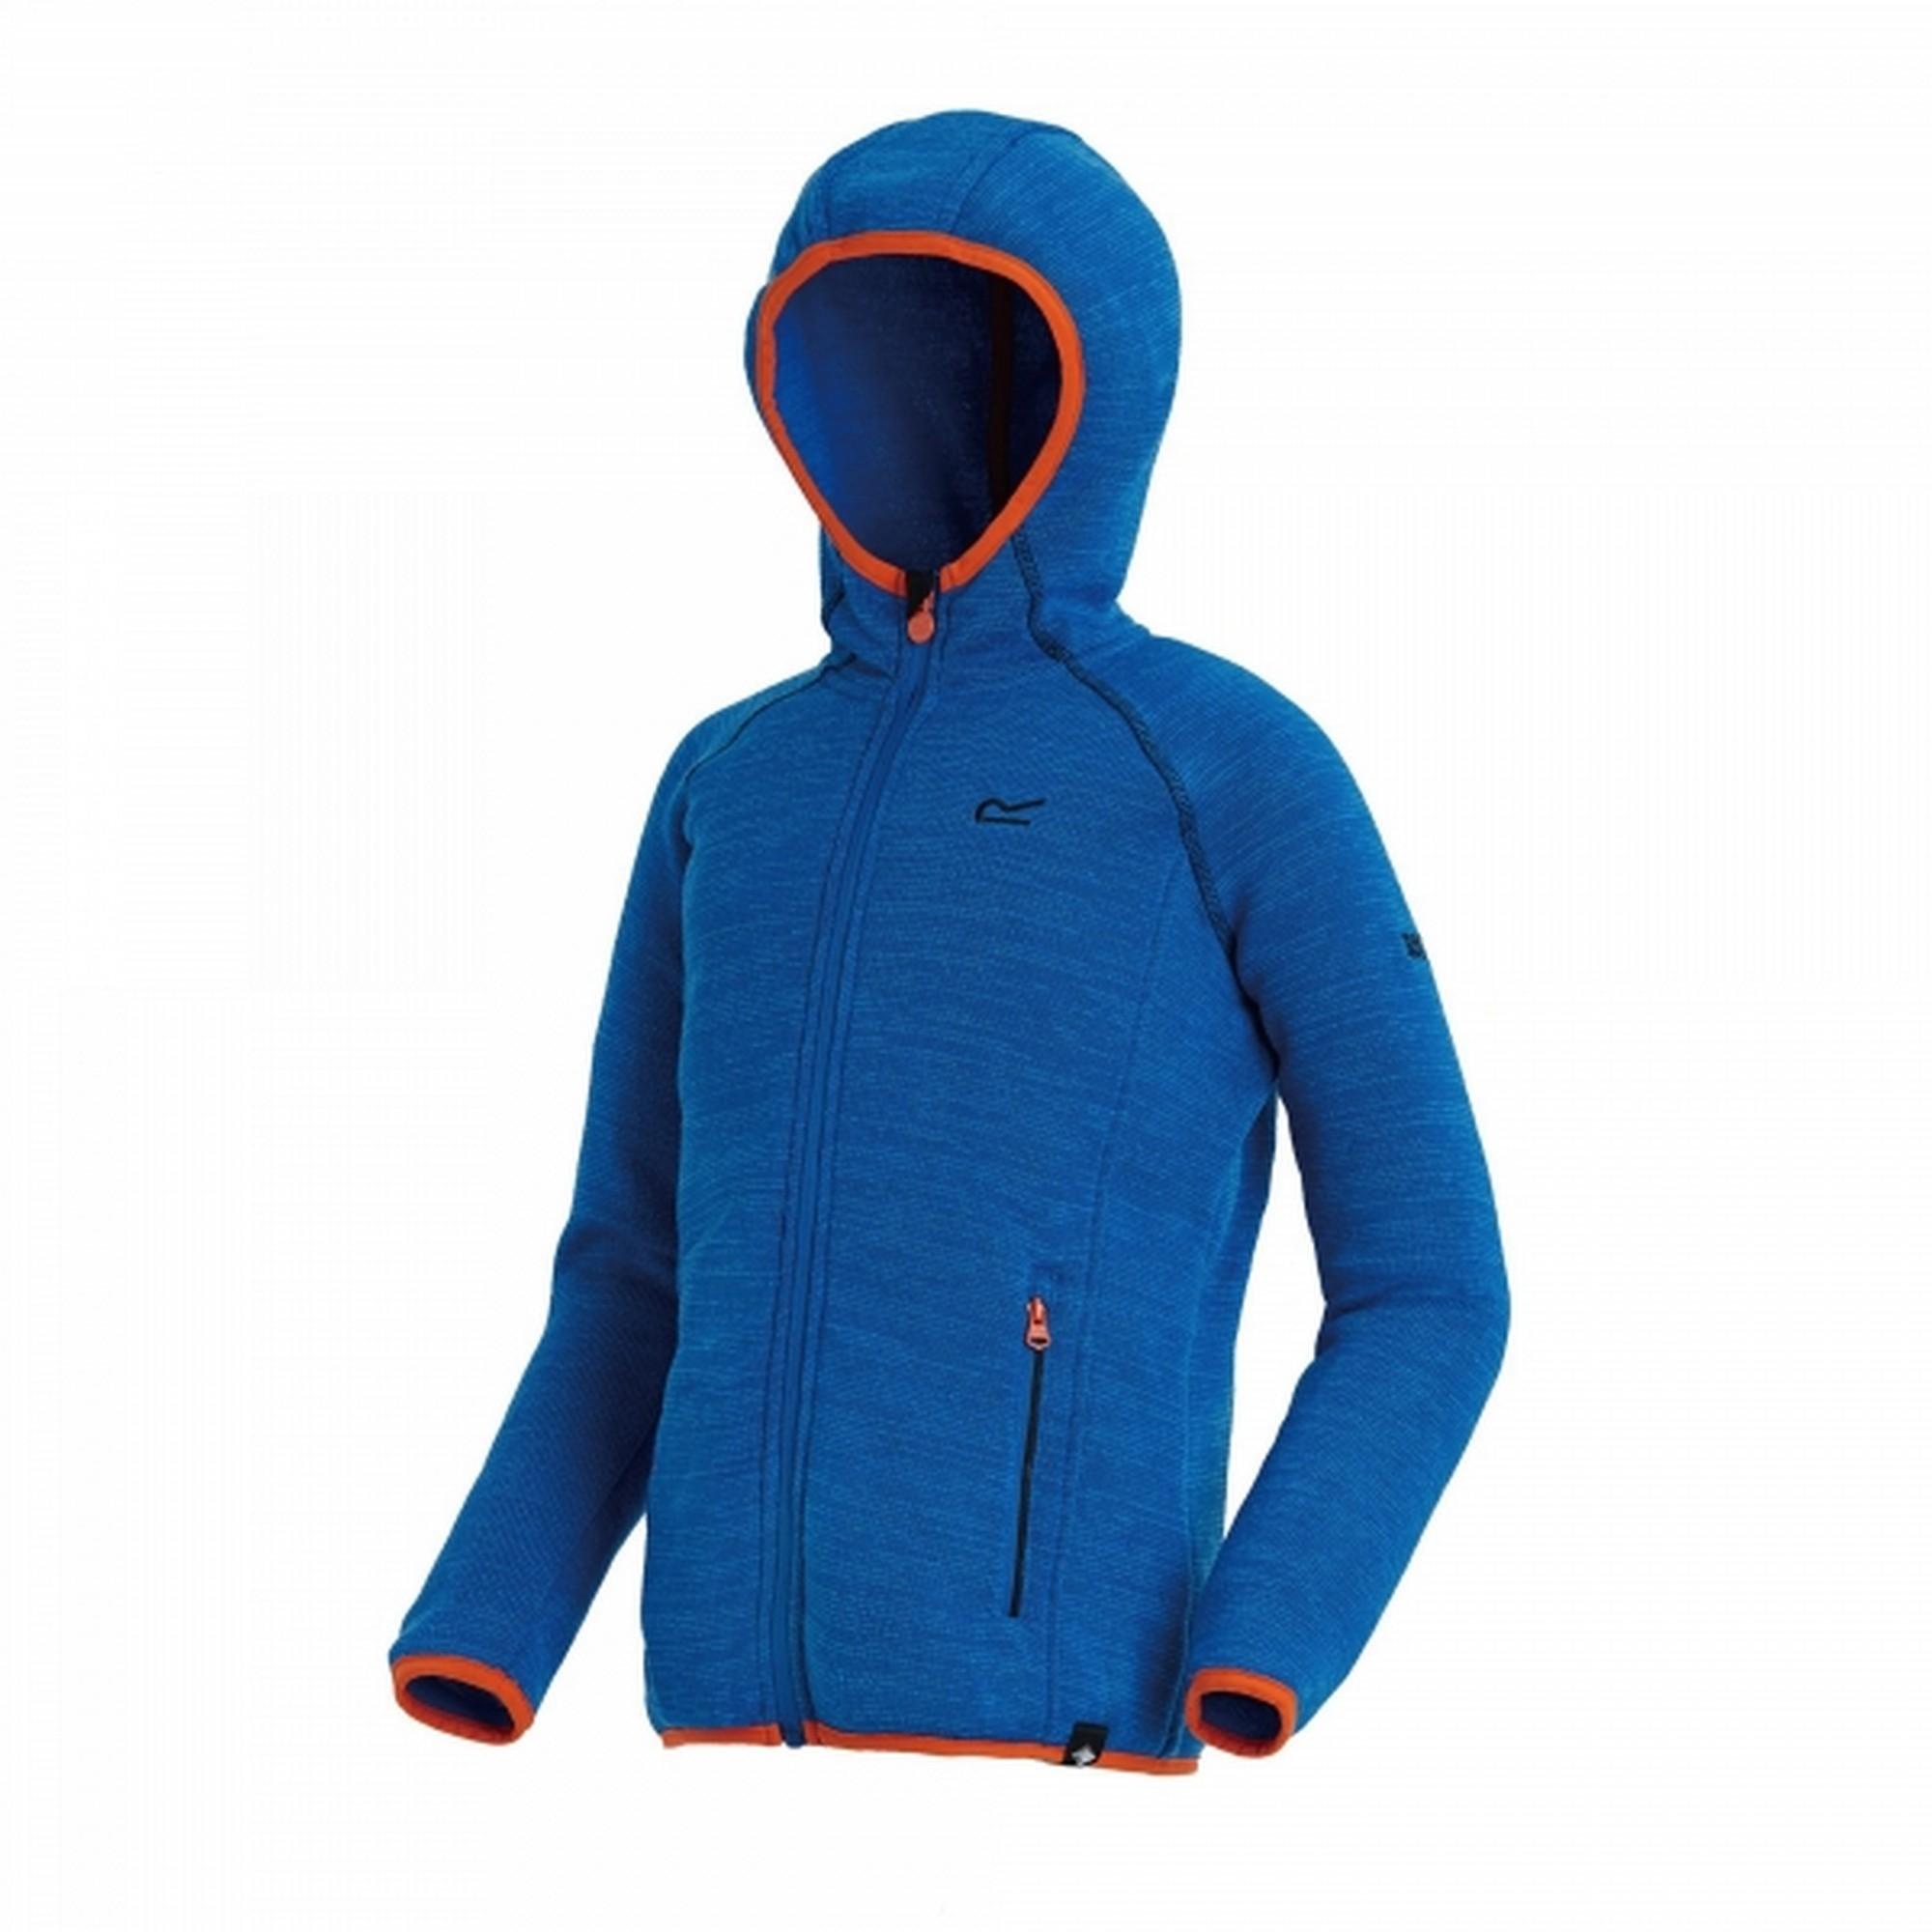 cf13b516c Regatta Great Outdoors Childrens  Kids Upflow Hooded Fleece Jacket ...